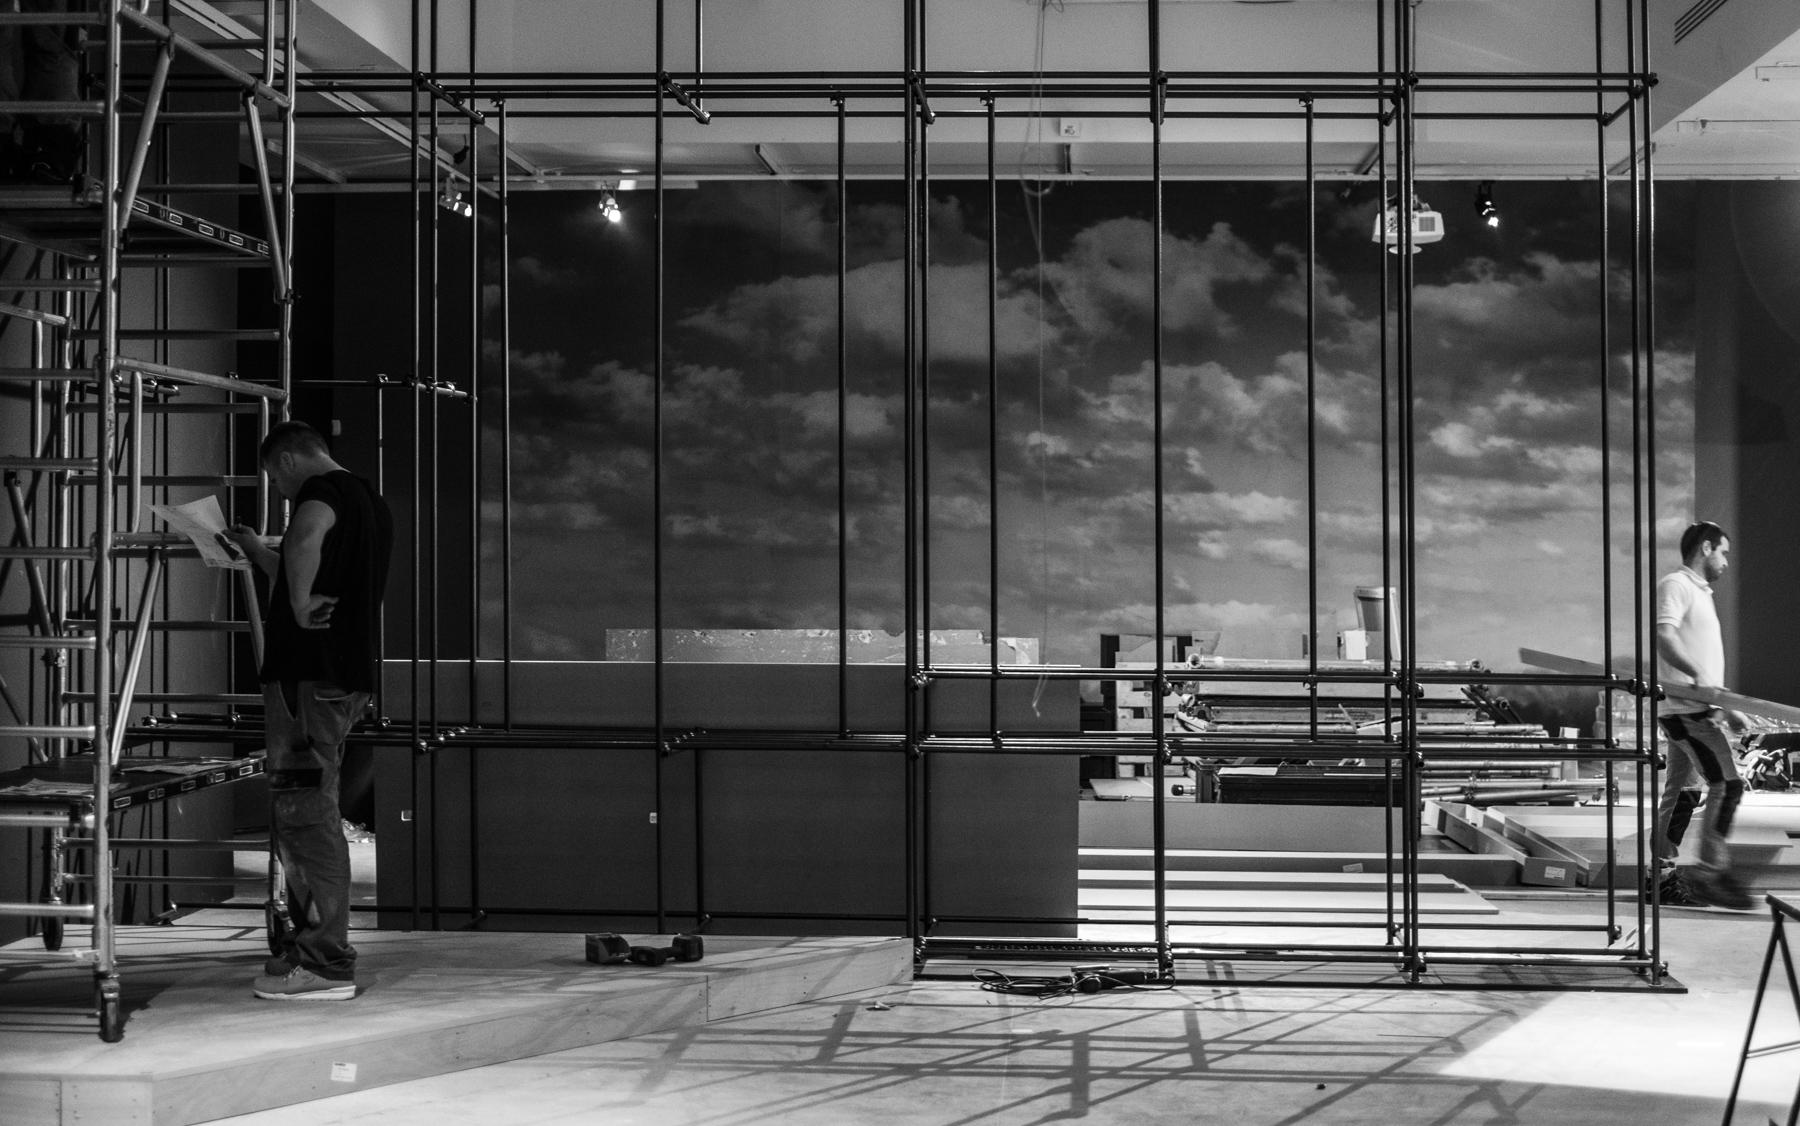 Exposition Fellini Picasso Scénographie